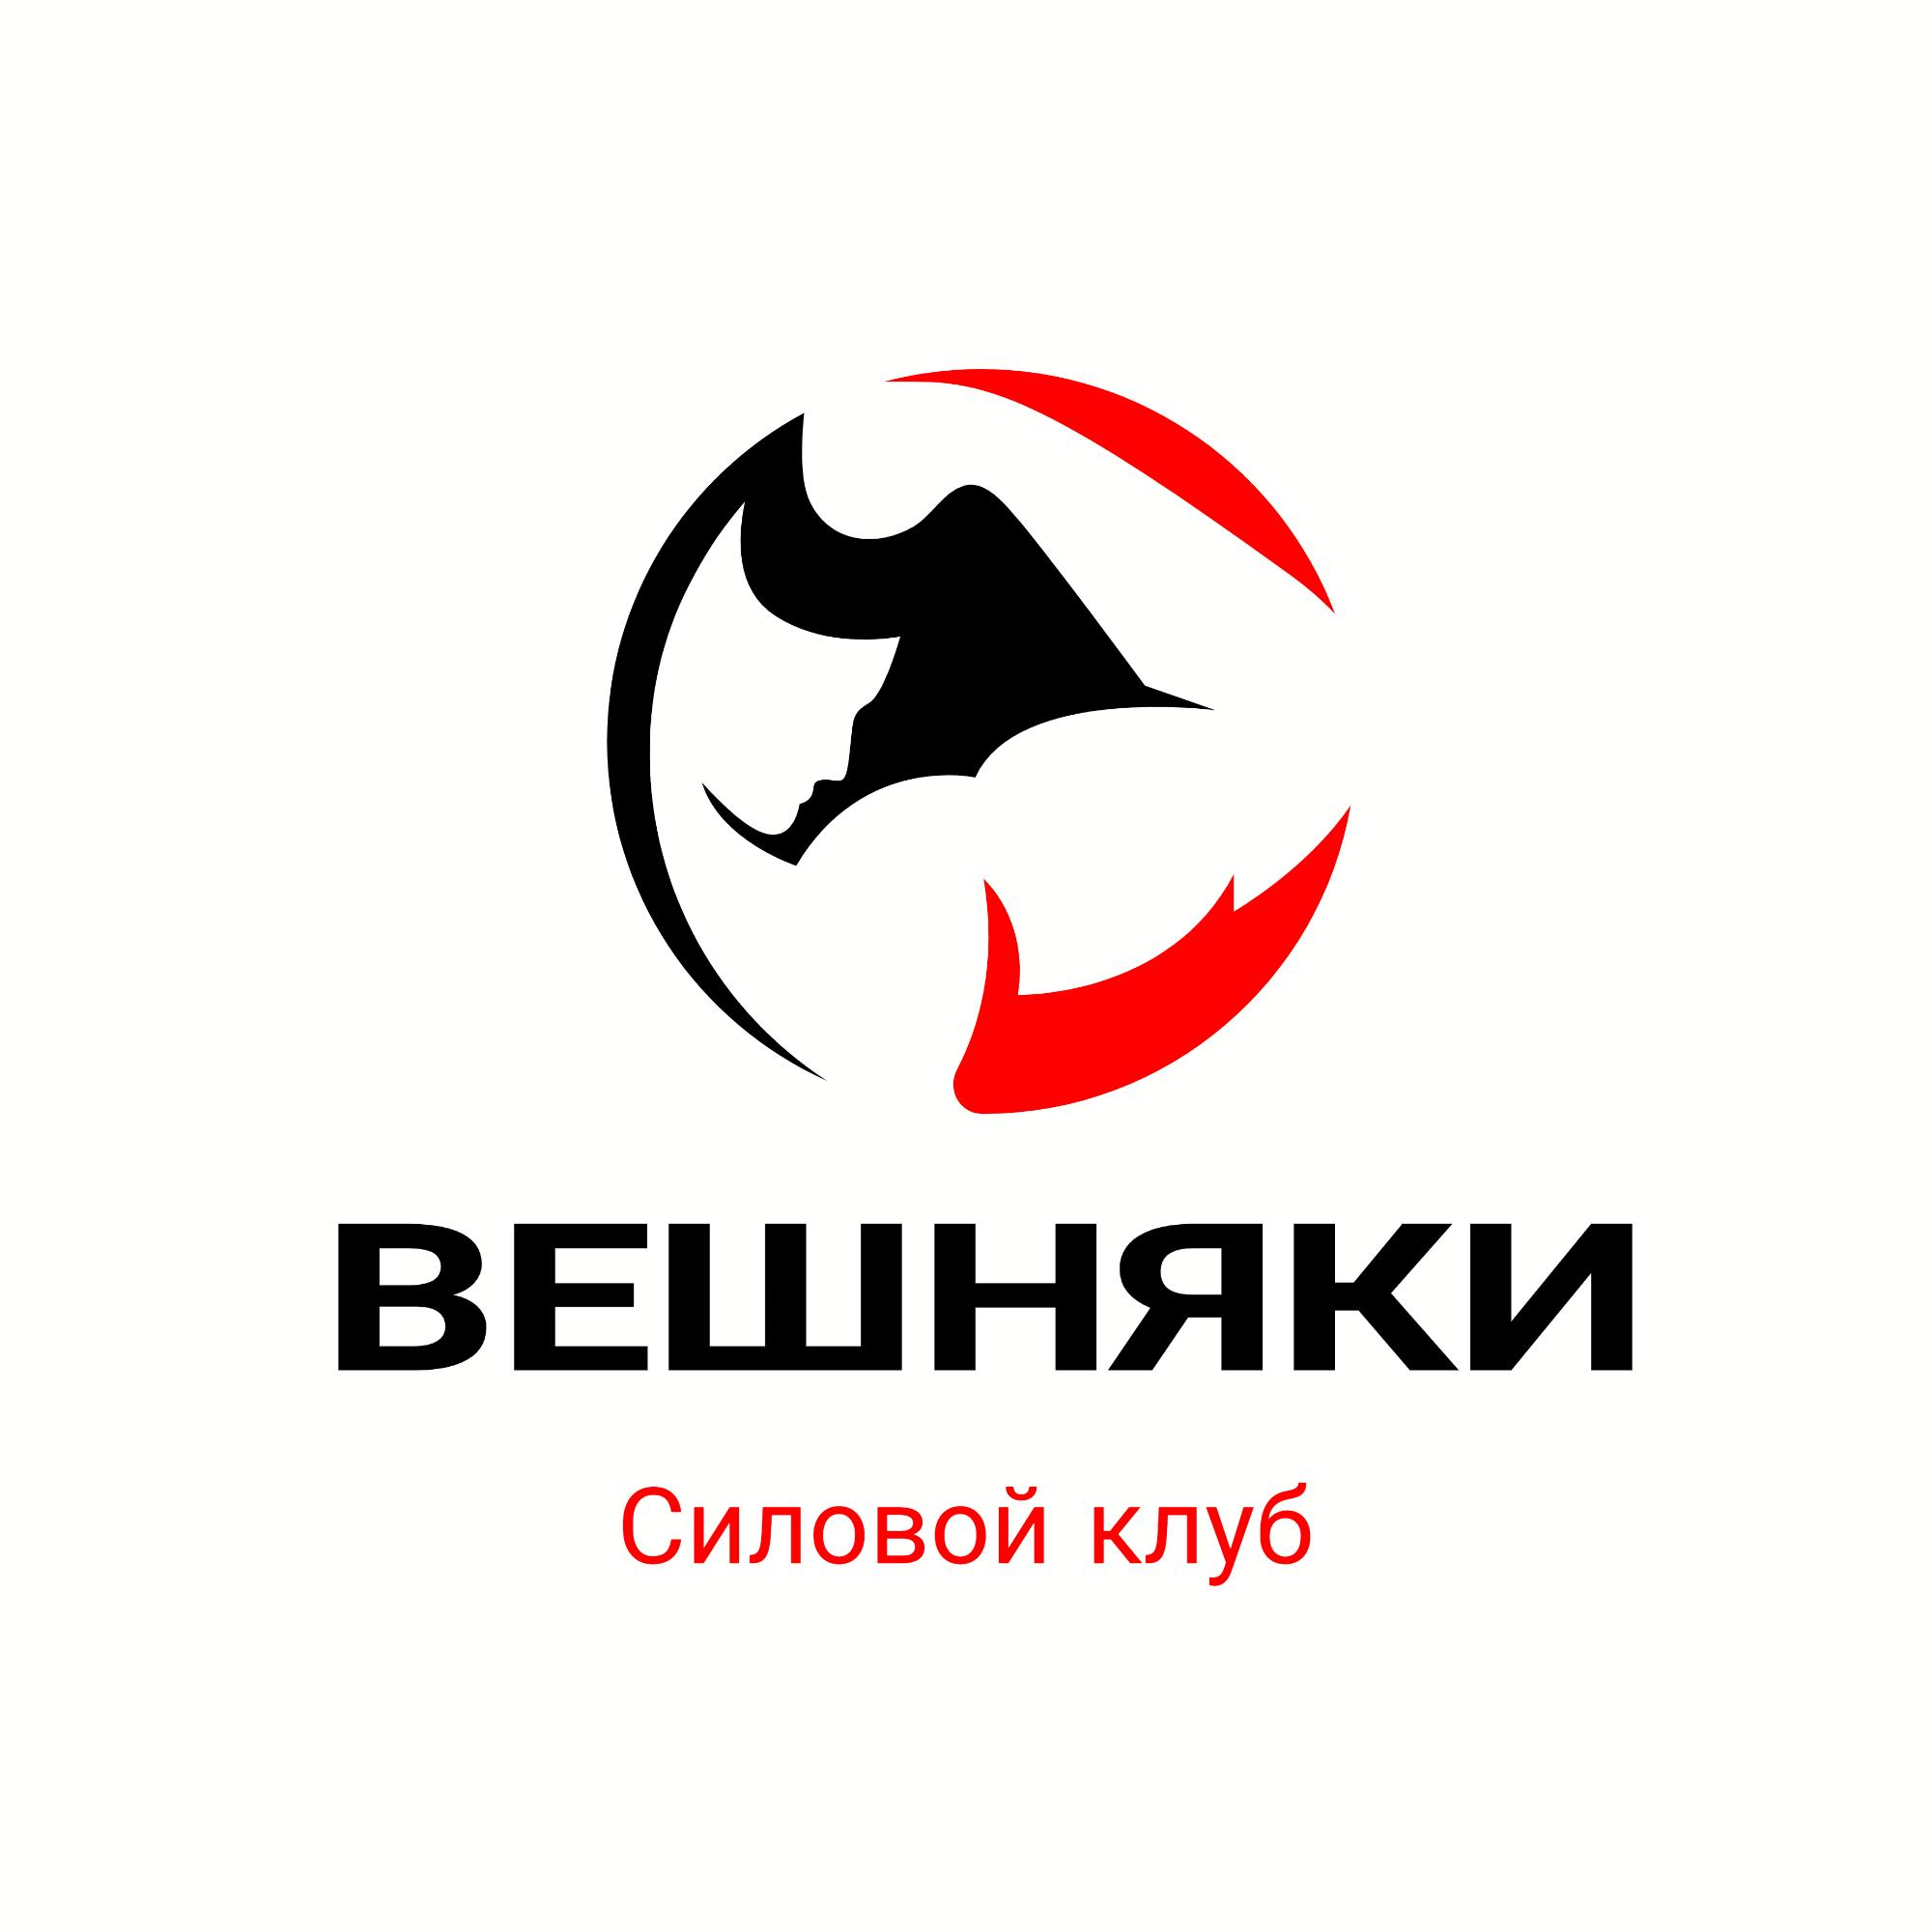 Адаптация (разработка) логотипа Силового клуба ВЕШНЯКИ в инт фото f_9655fb92b21aca83.jpg